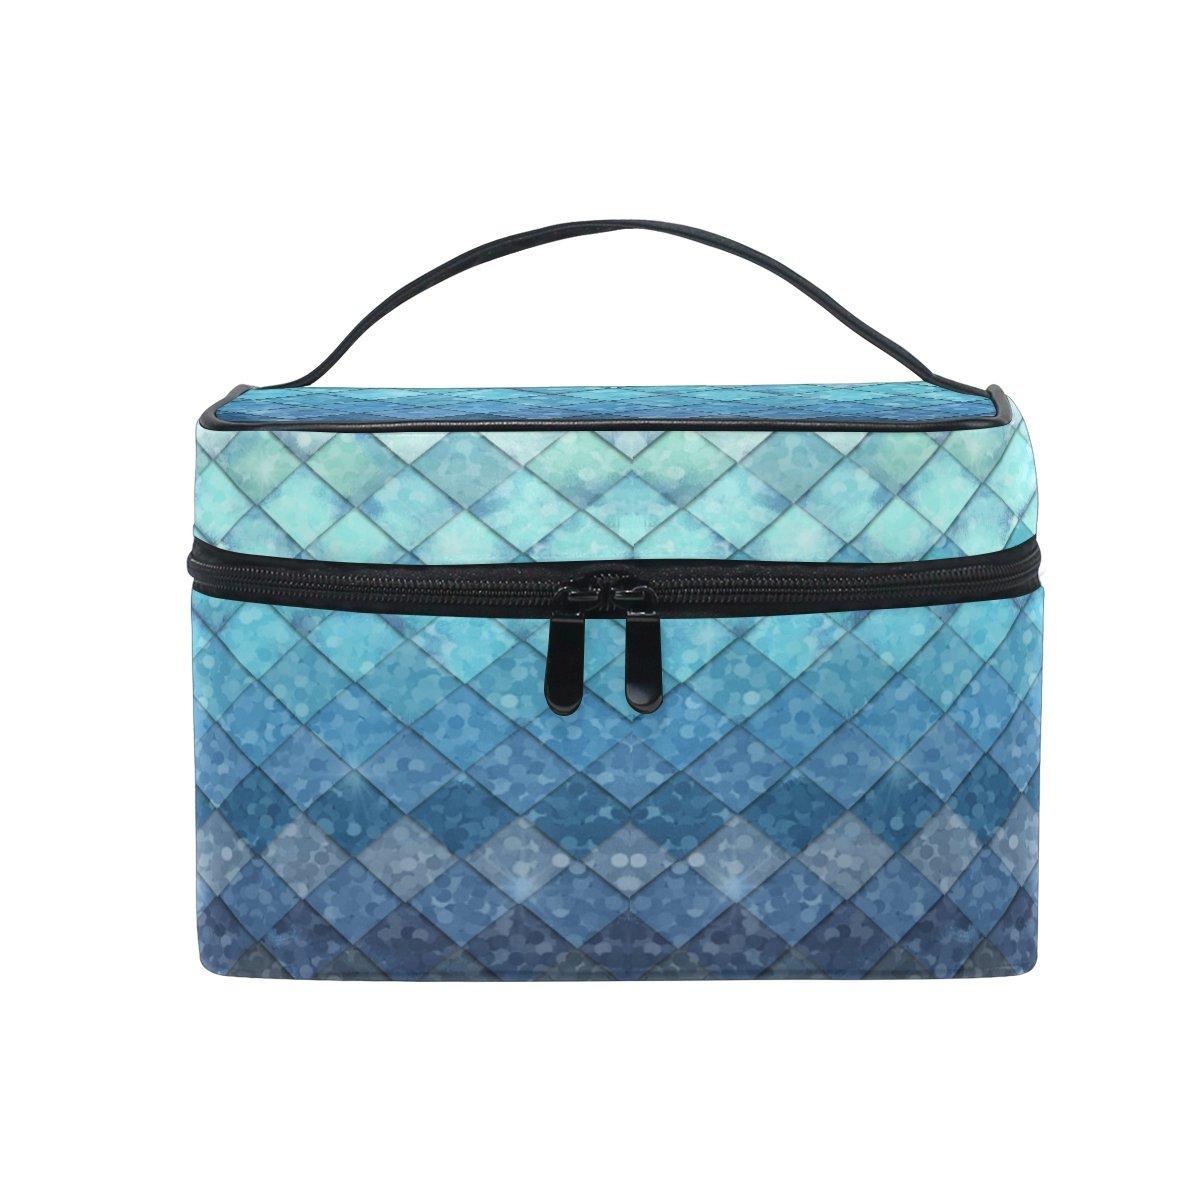 ZOEO Makeup Train Case Royal Blue Mermaid Scales Geometric Rhombus Korean Carrying Portable Zip Travel Cosmetic Brush Bag Organizer Large for Girls Women